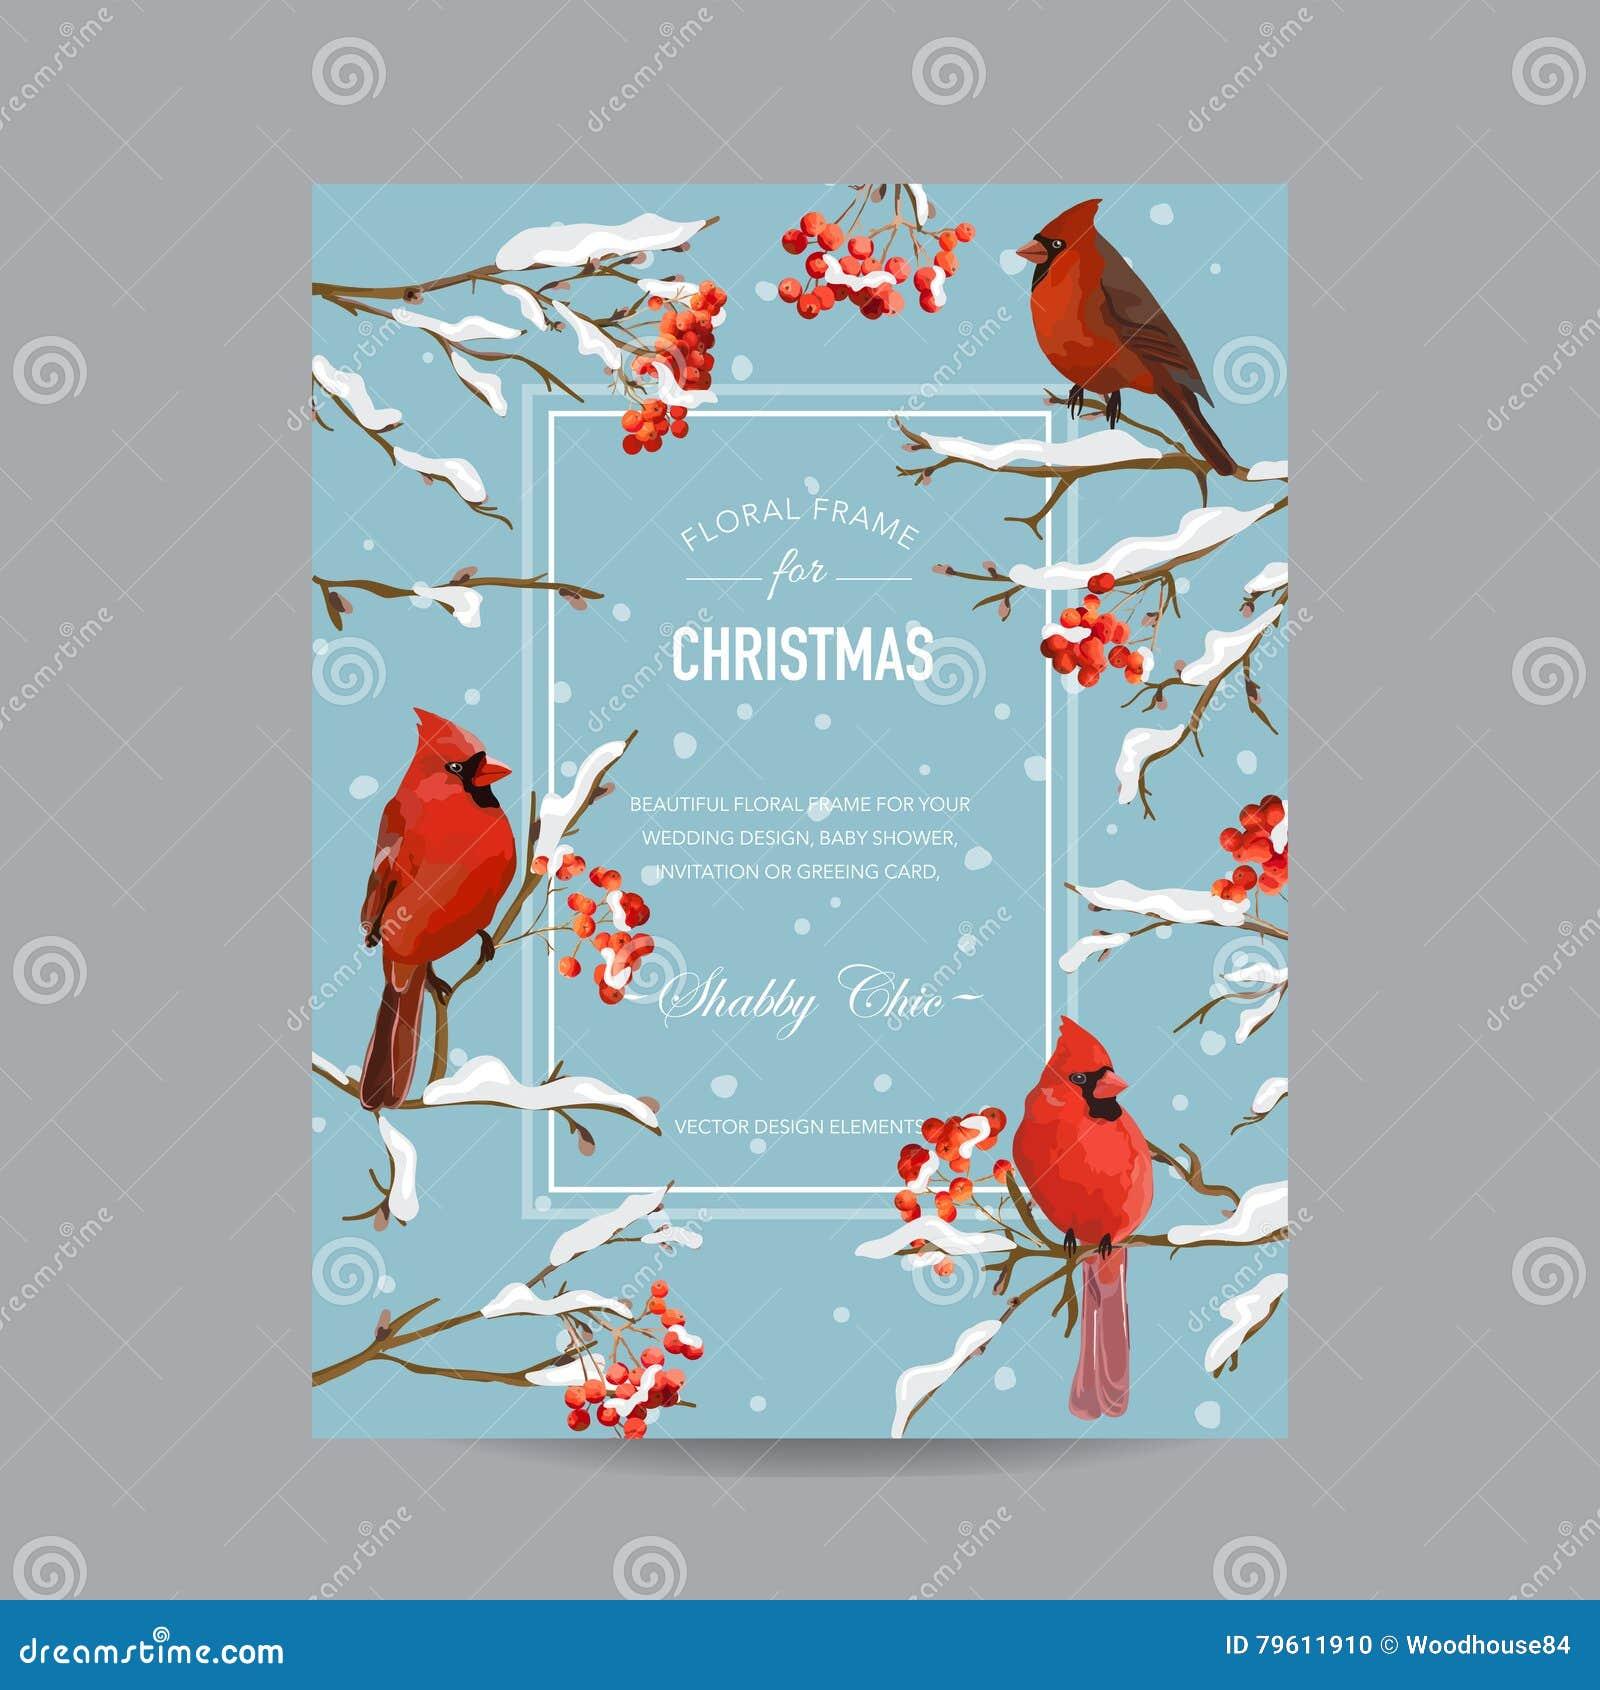 Winter-Vögel Und Beeren-Rahmen Oder Karte - In Der Aquarell-Art ...